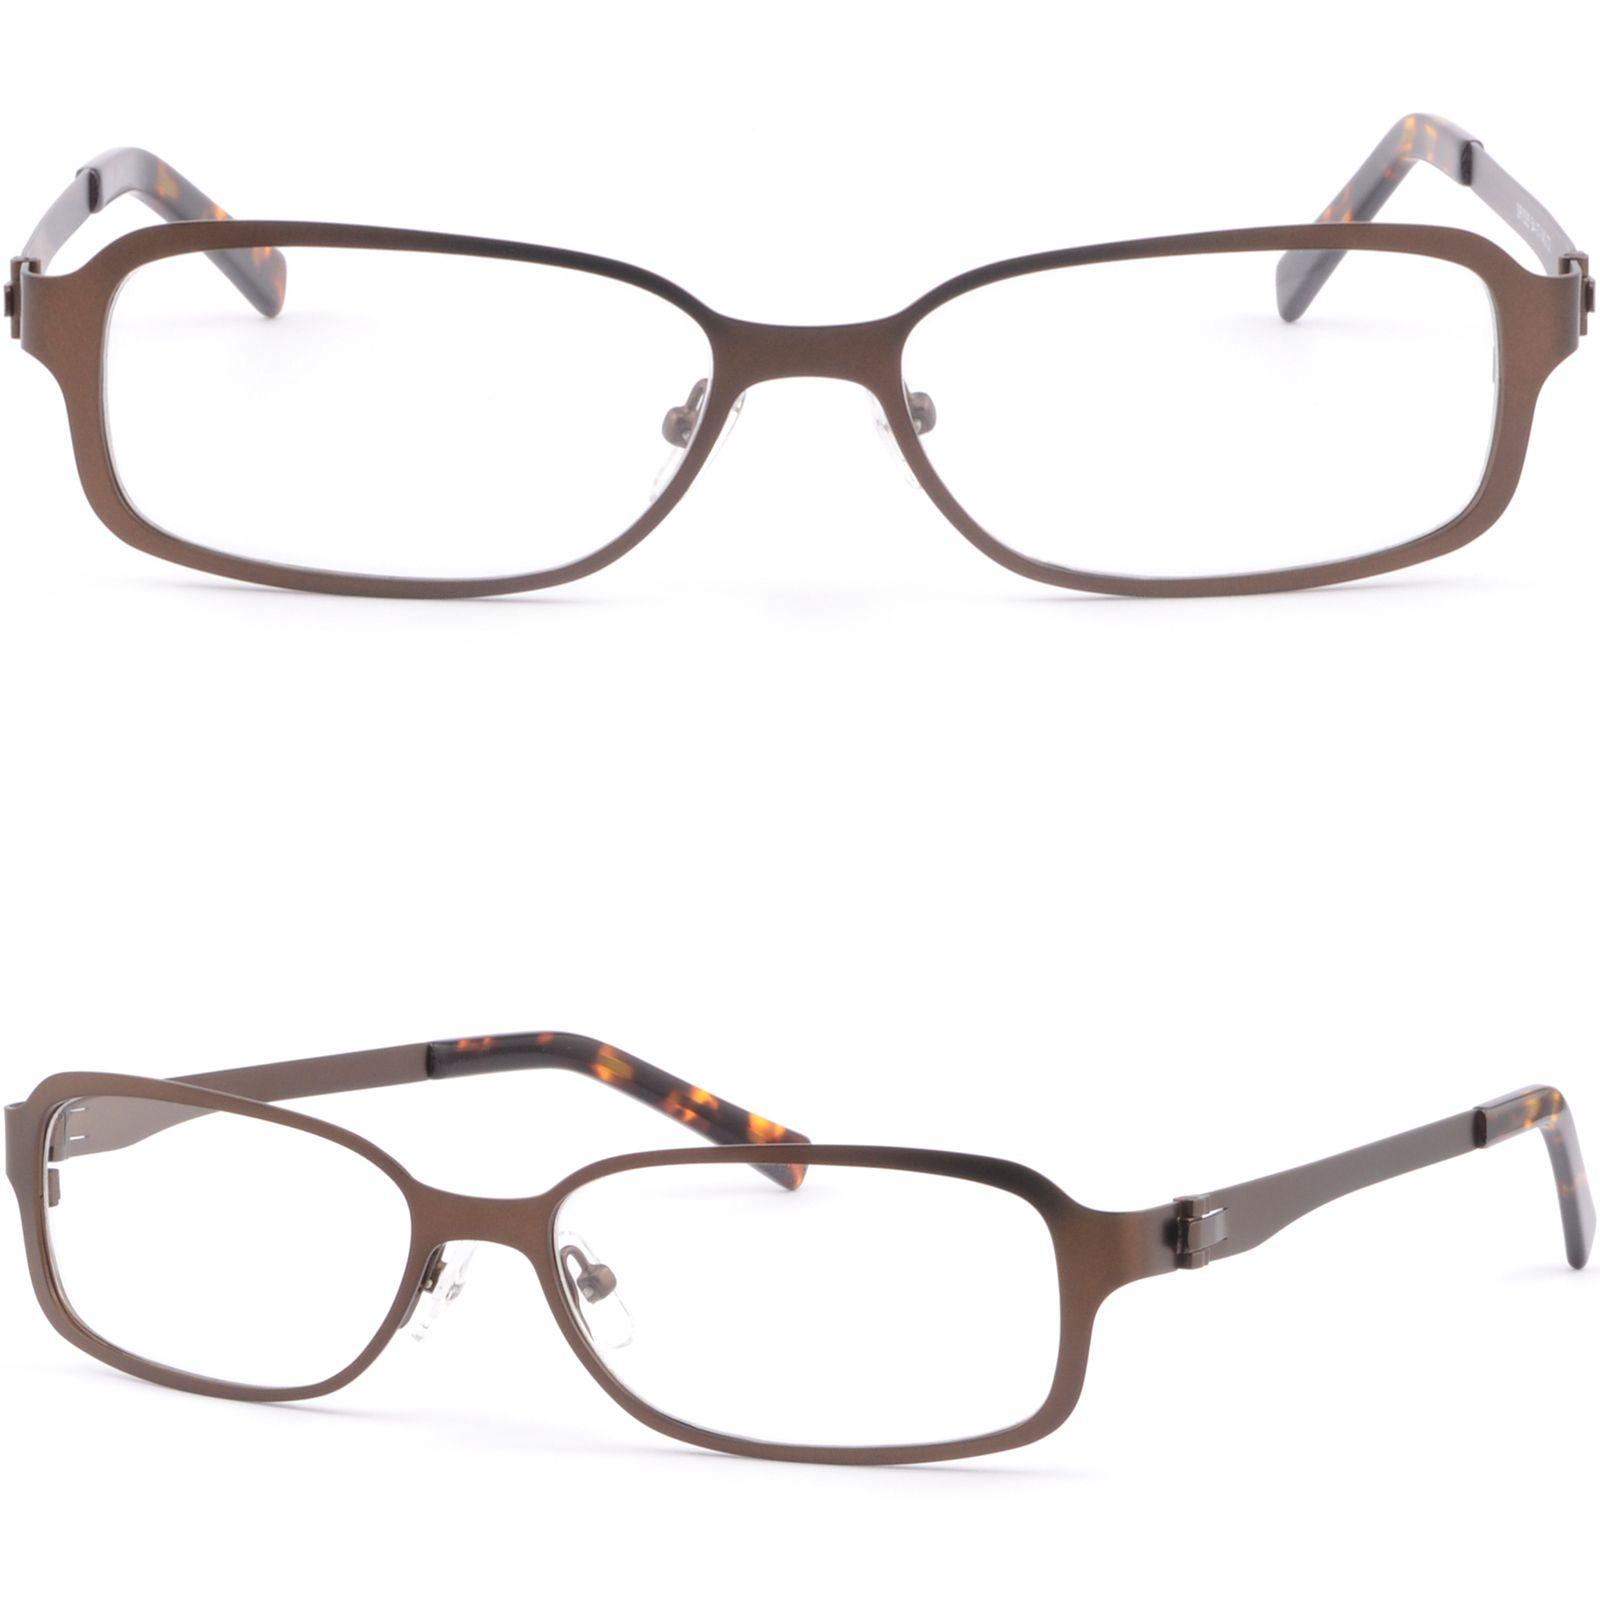 3fdd2779301 Brown Womens Men s Metallic Metal Frame Light Prescription Glasses RX Sunglasses  Glasses Frame Online with  34.23 Piece on Aceglasses s Store